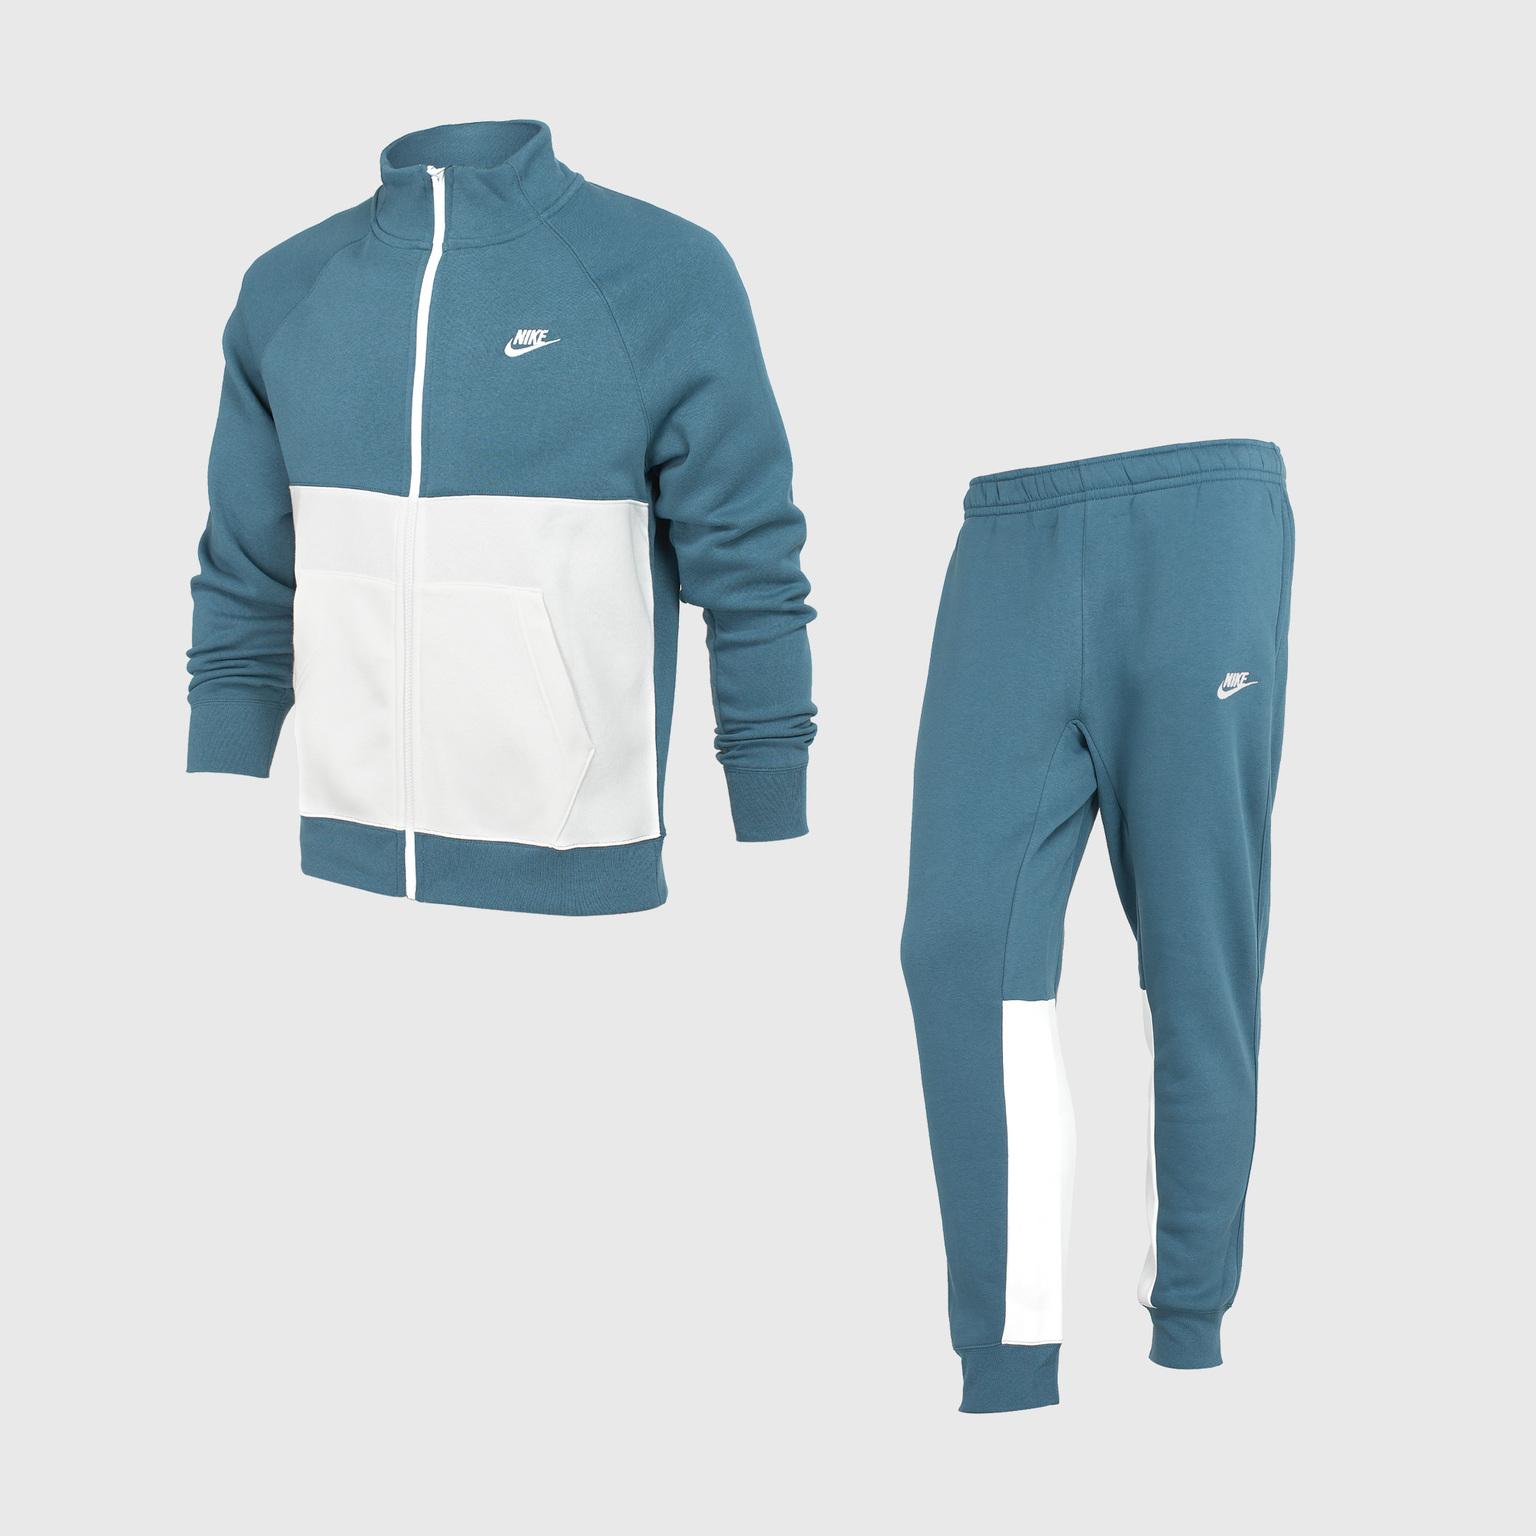 Костюм спортивный Nike SPE Fleece Suit BV3017-058